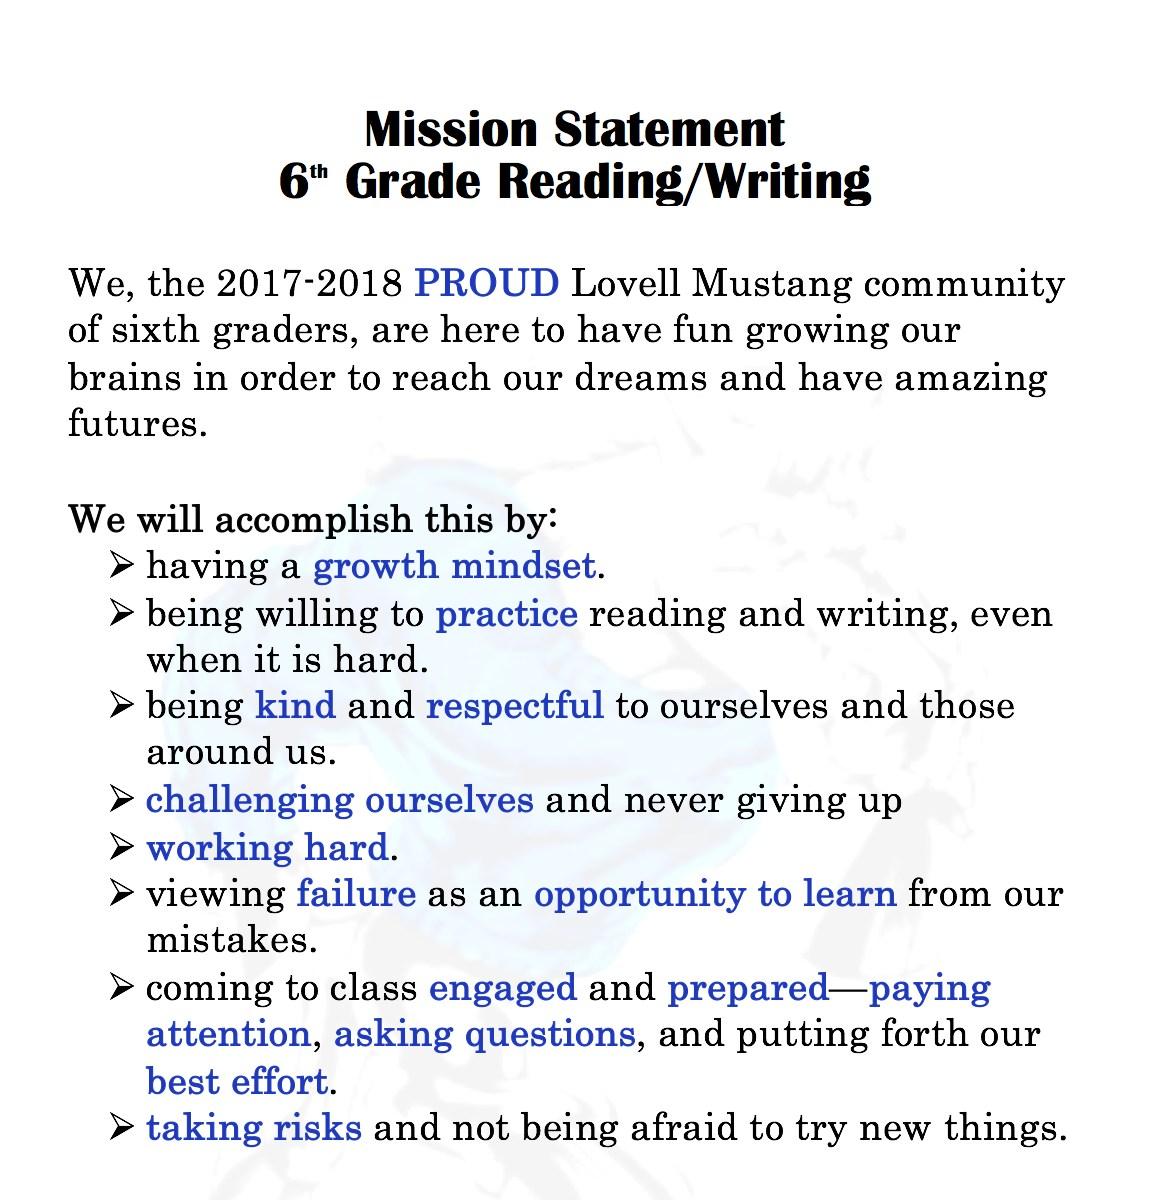 2017/2018 Student Mission Statement